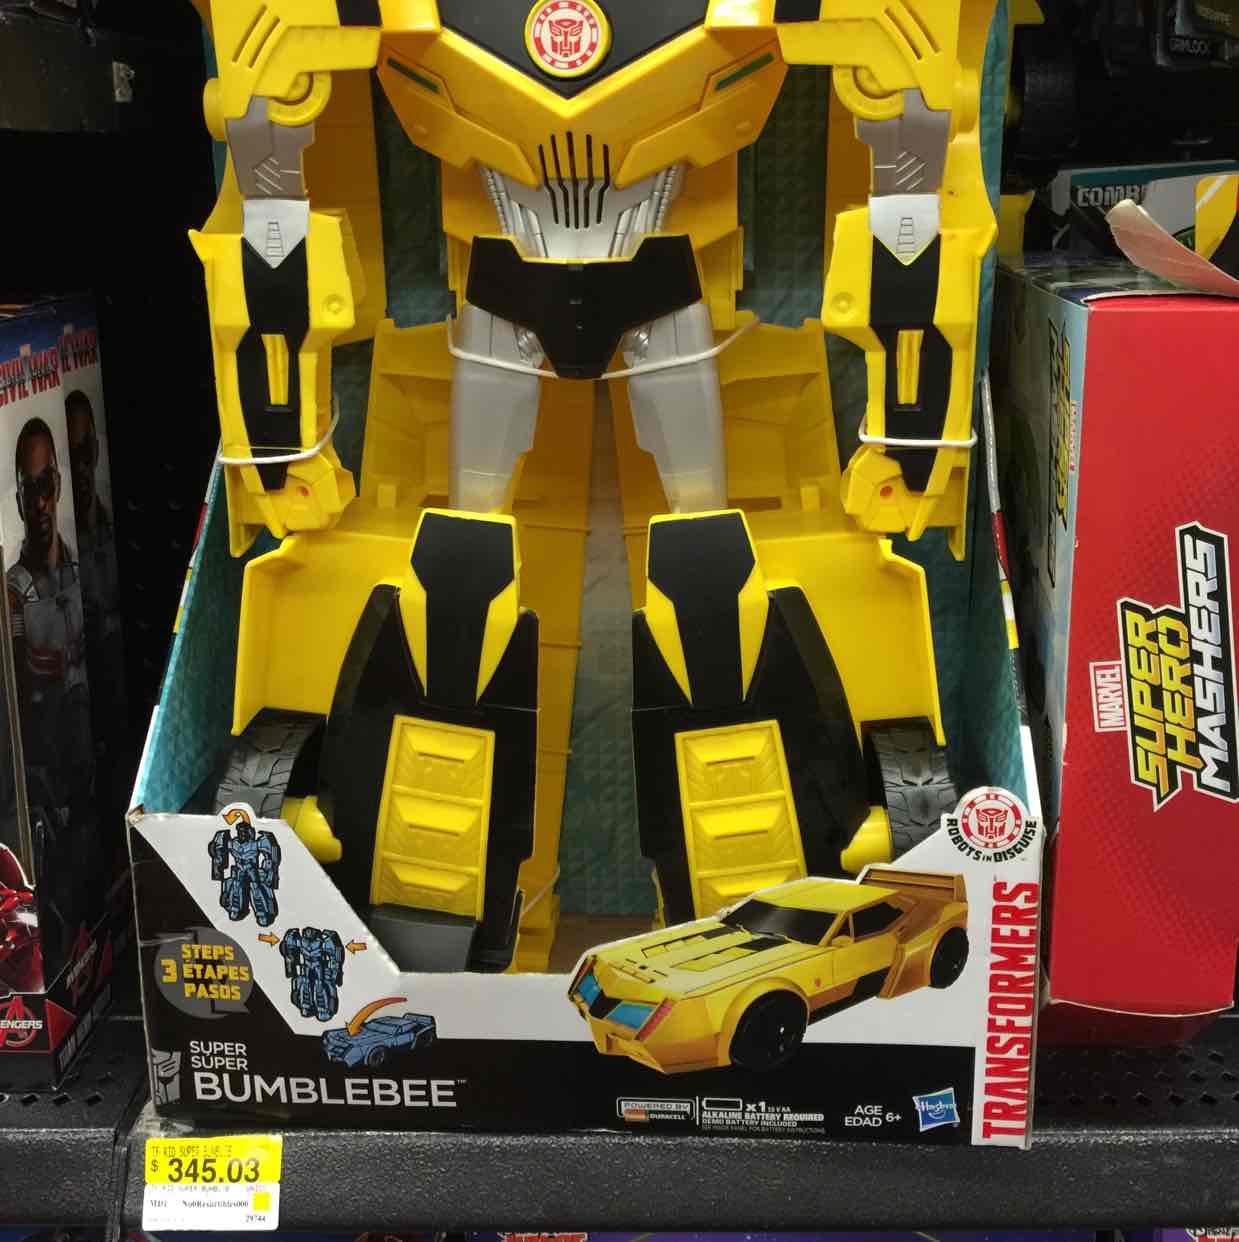 Walmart: bublebee transformes gigante a $345.03